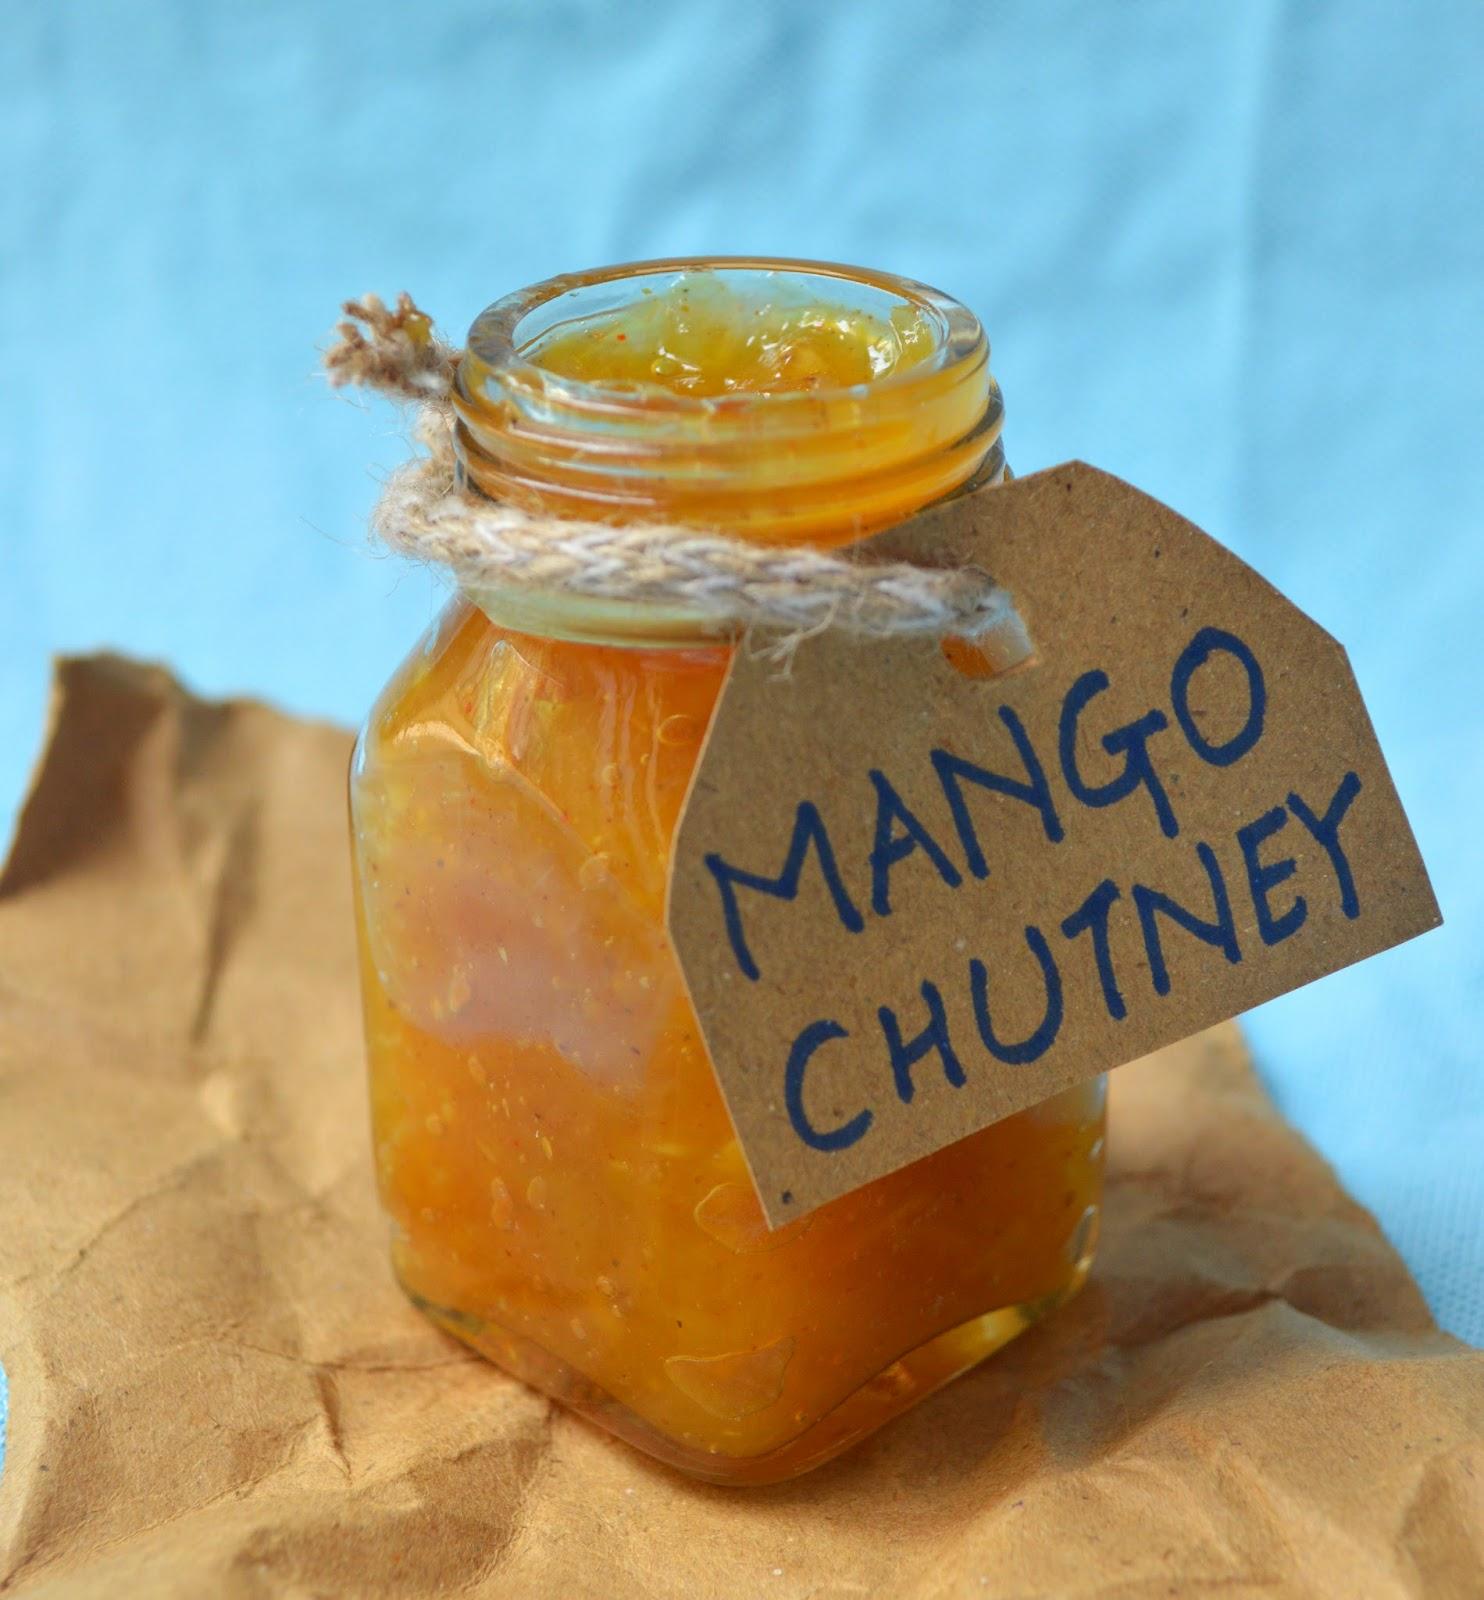 Mango Chutney | Kachhe Aam ki Chutney